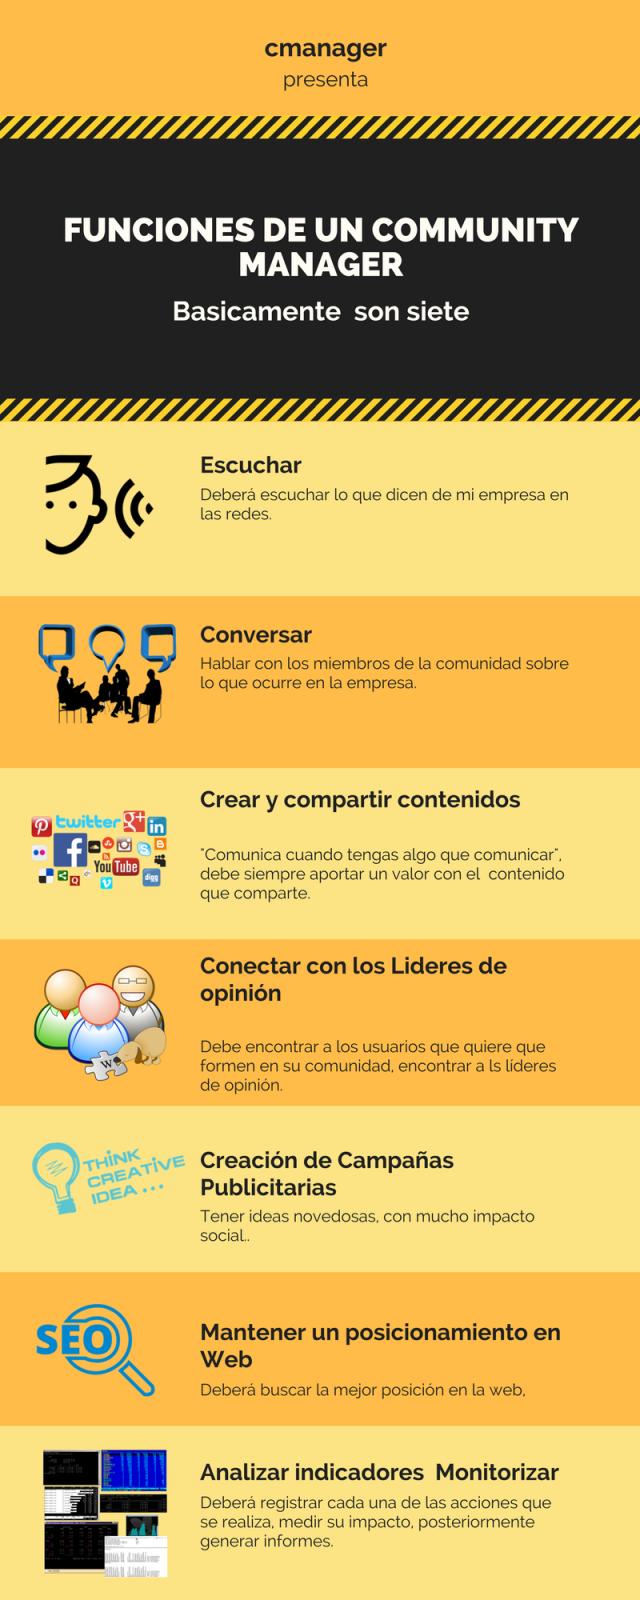 Zamorano_Jose Luis_Infografia